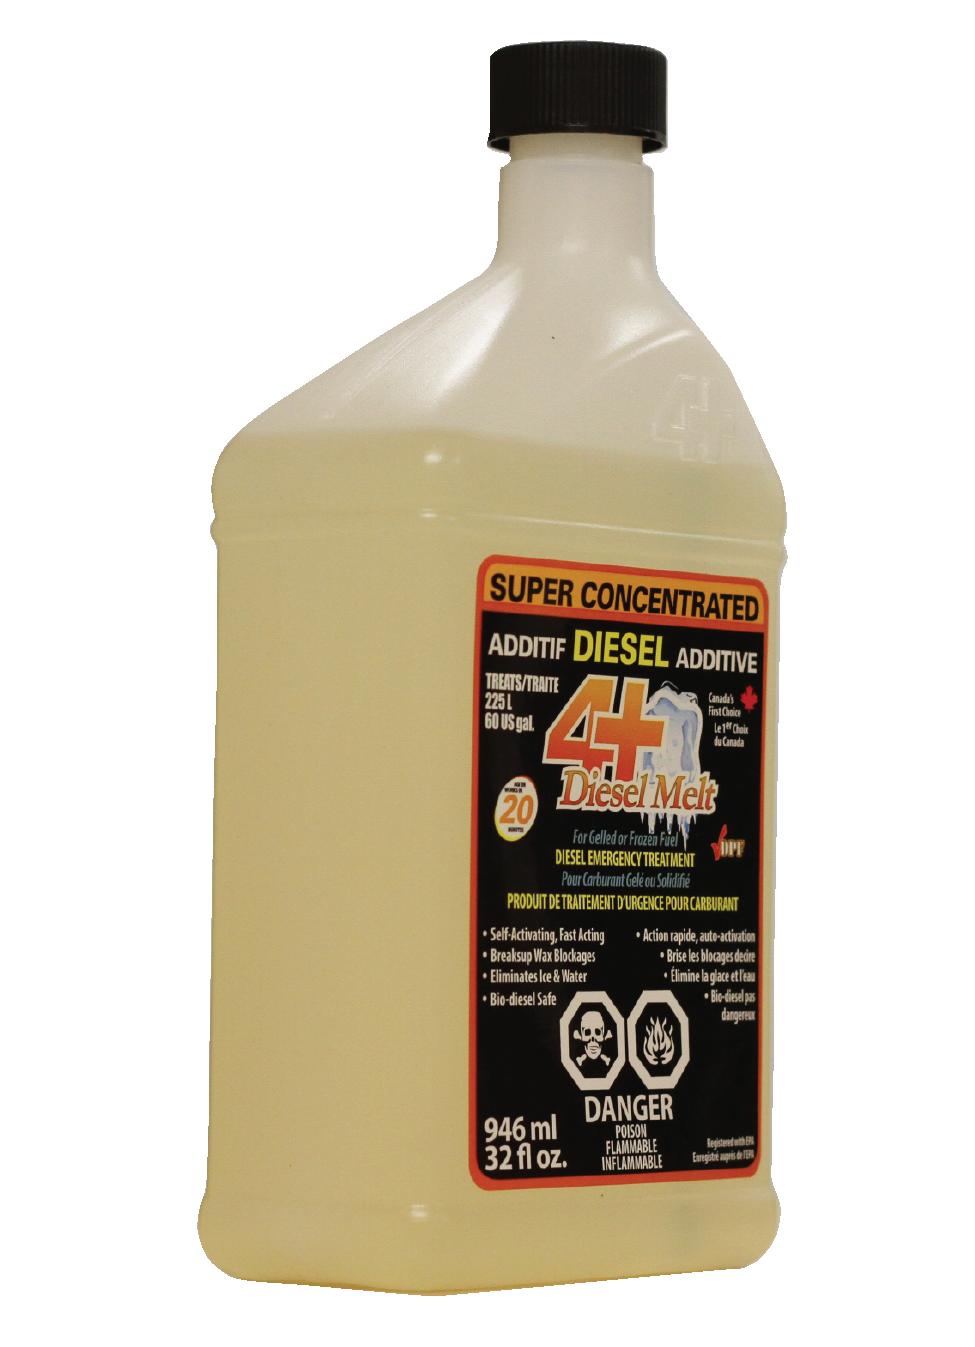 4+ Diesel Melt .5L